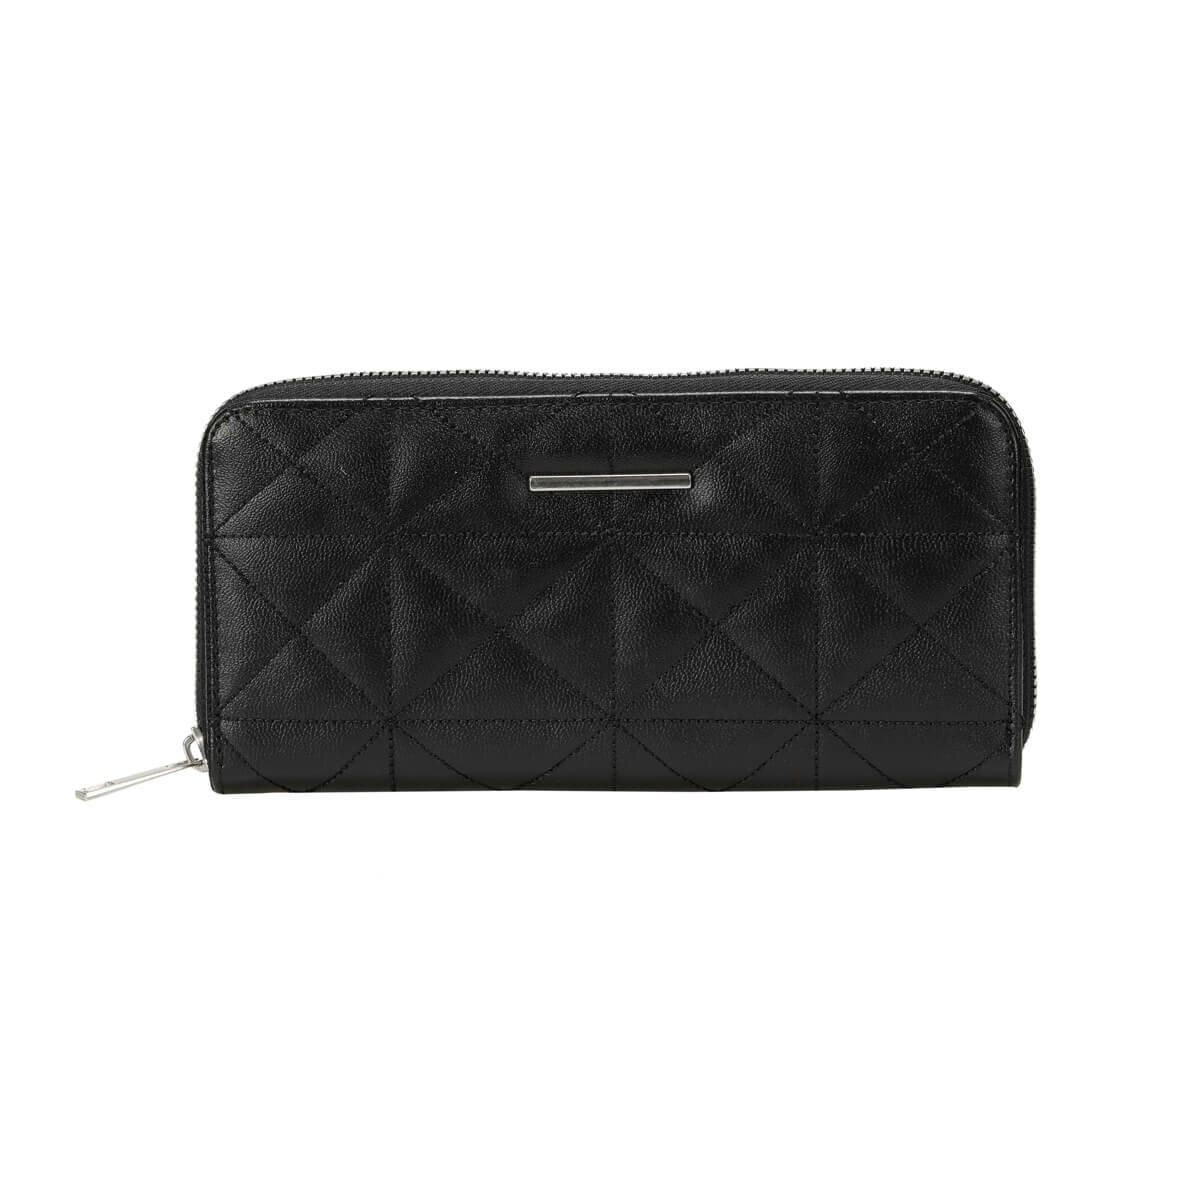 FLO Women Wallet Black Red Fashion Casual Female Wallet Bag Женский кошелек WRMD2221 BUTIGO